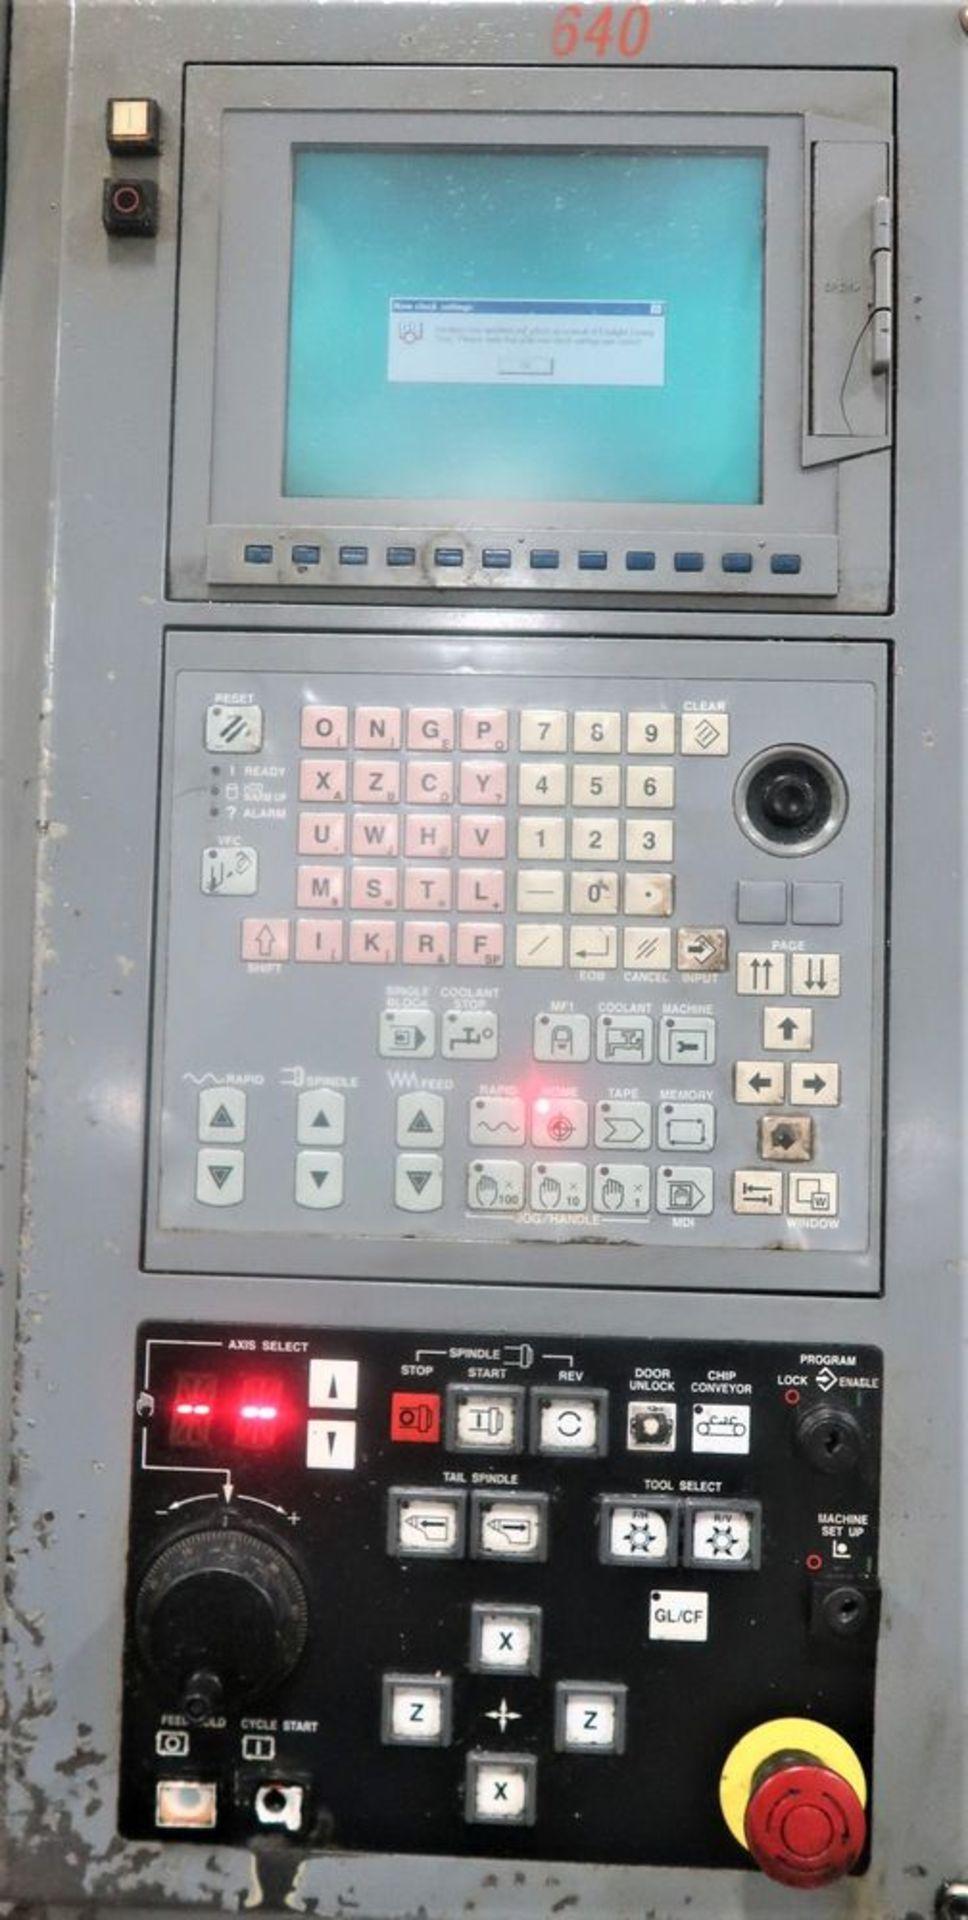 Lot 23 - Mazak Quick Turn Nexus 200 2-Axis CNC Turning Center Lathe, S/N 162570